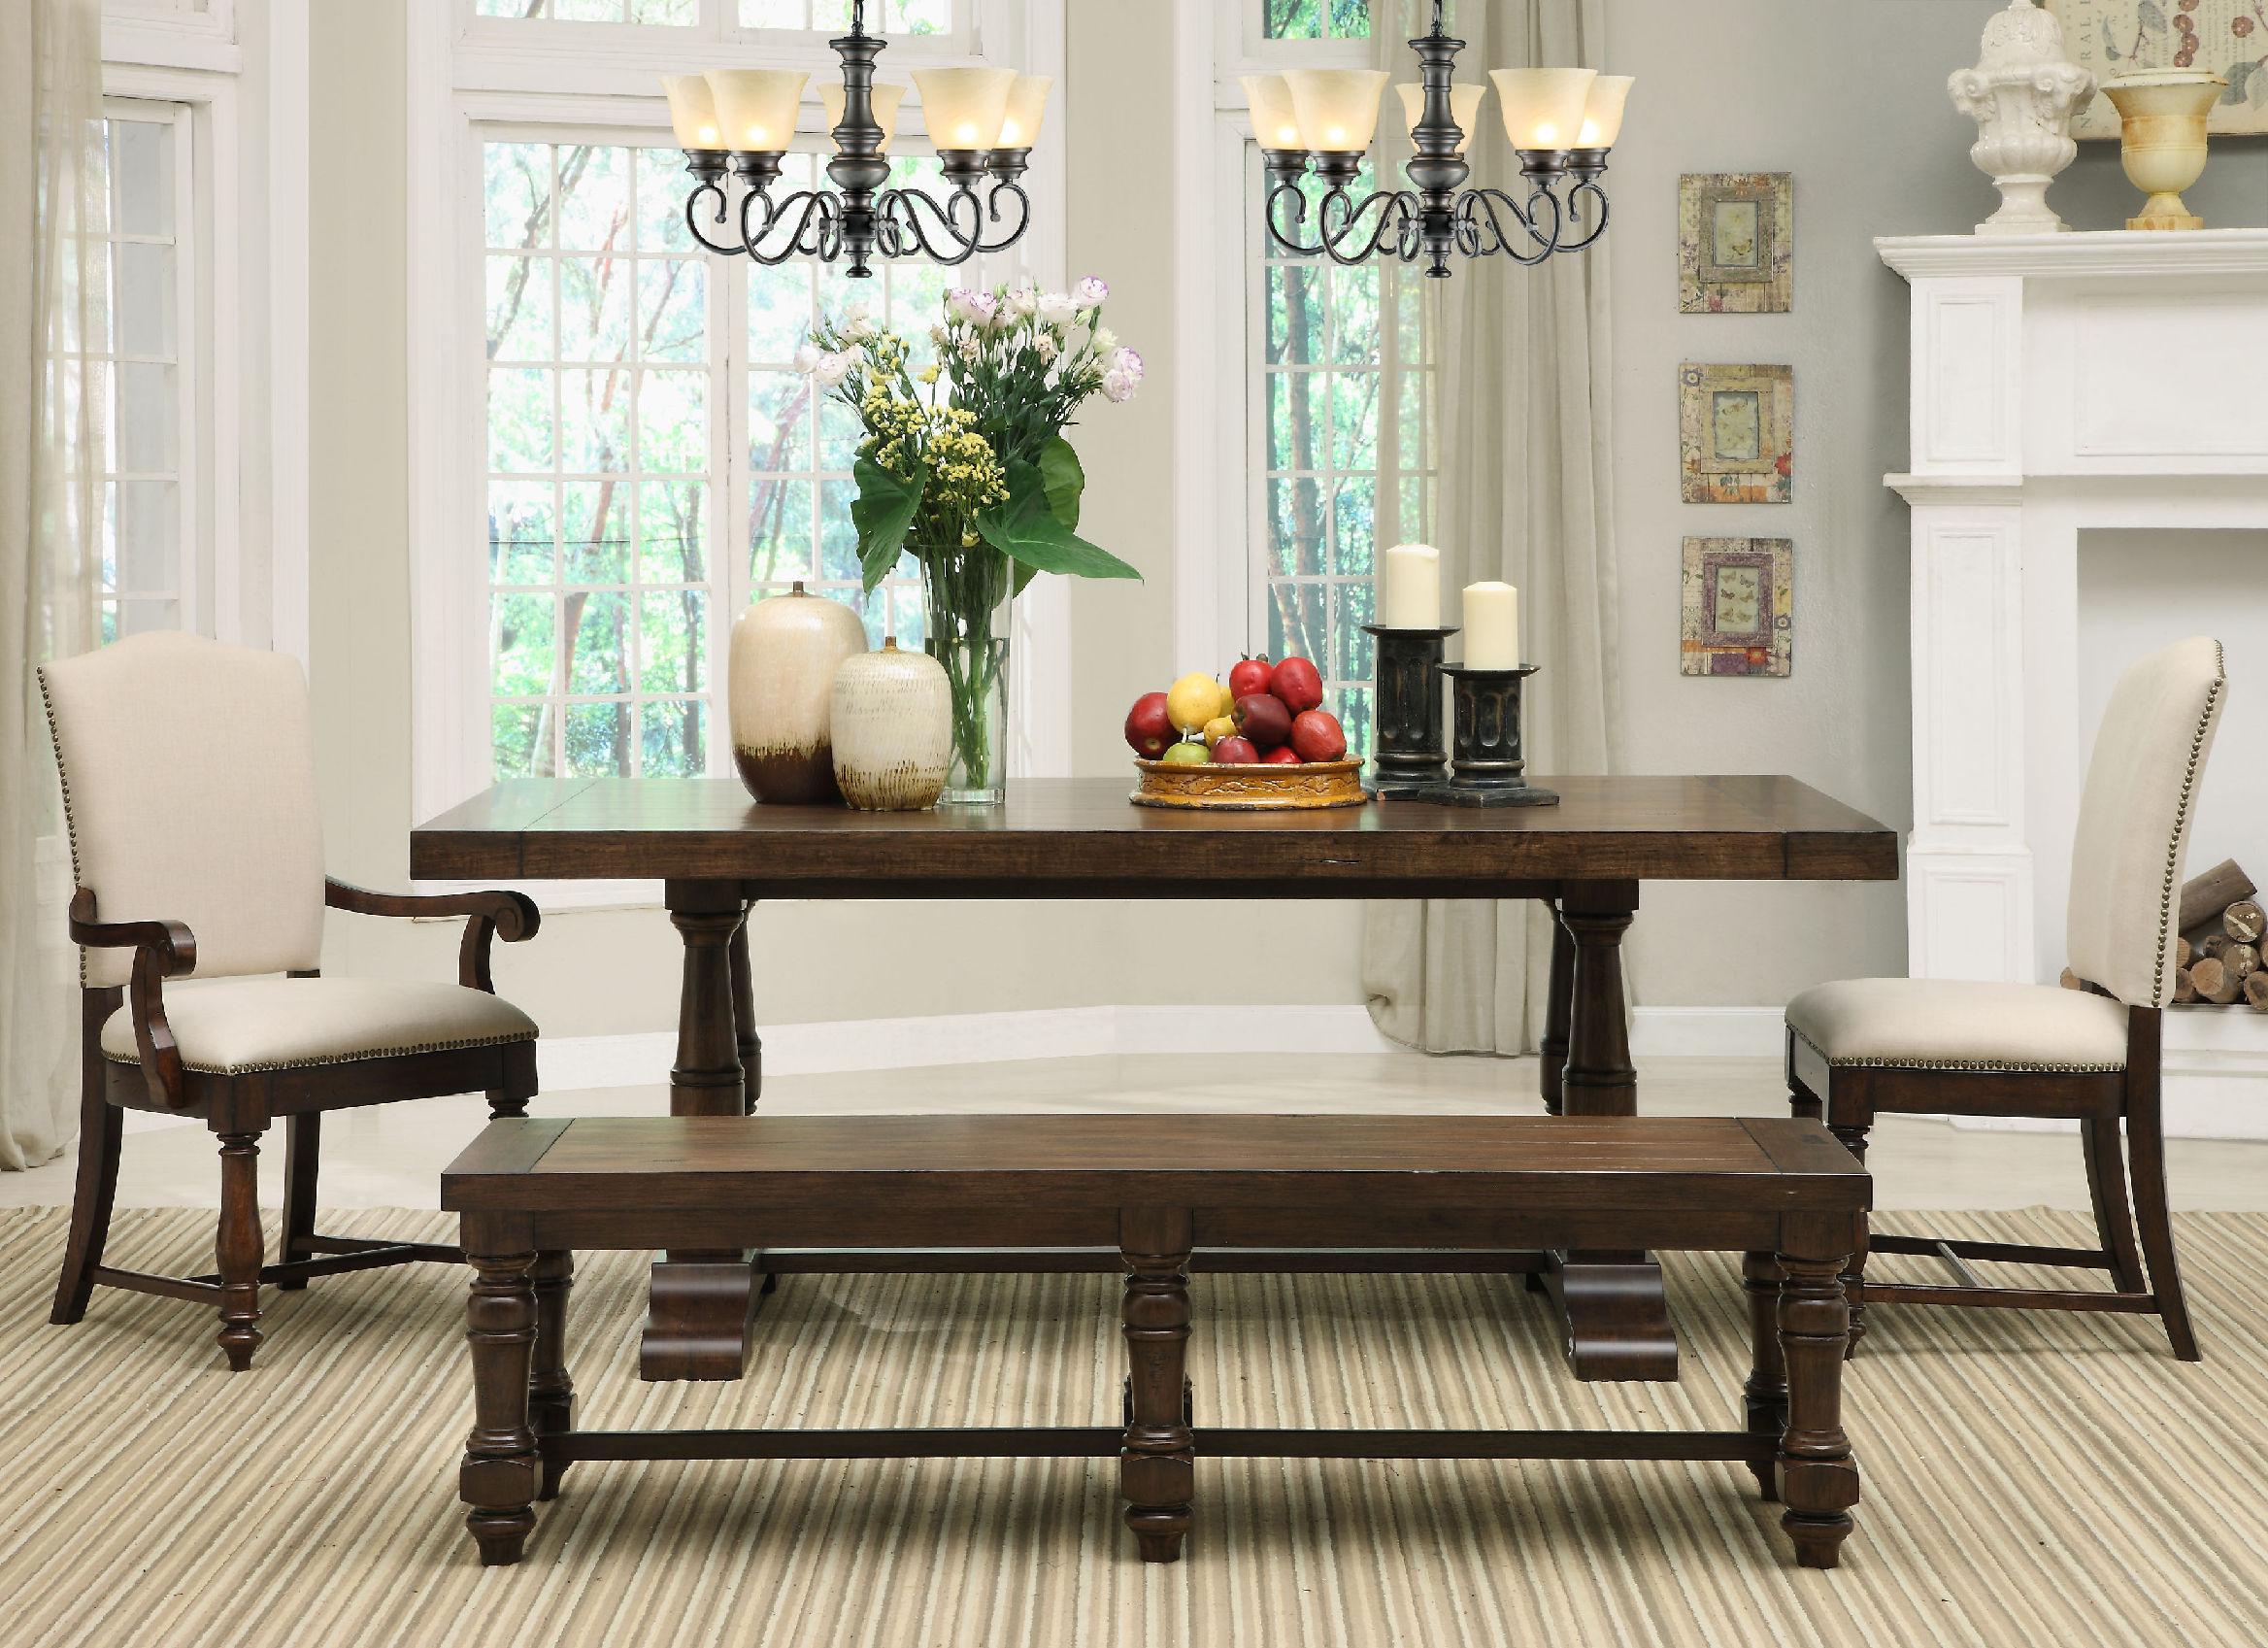 Fullsize Of Home Farm Furniture